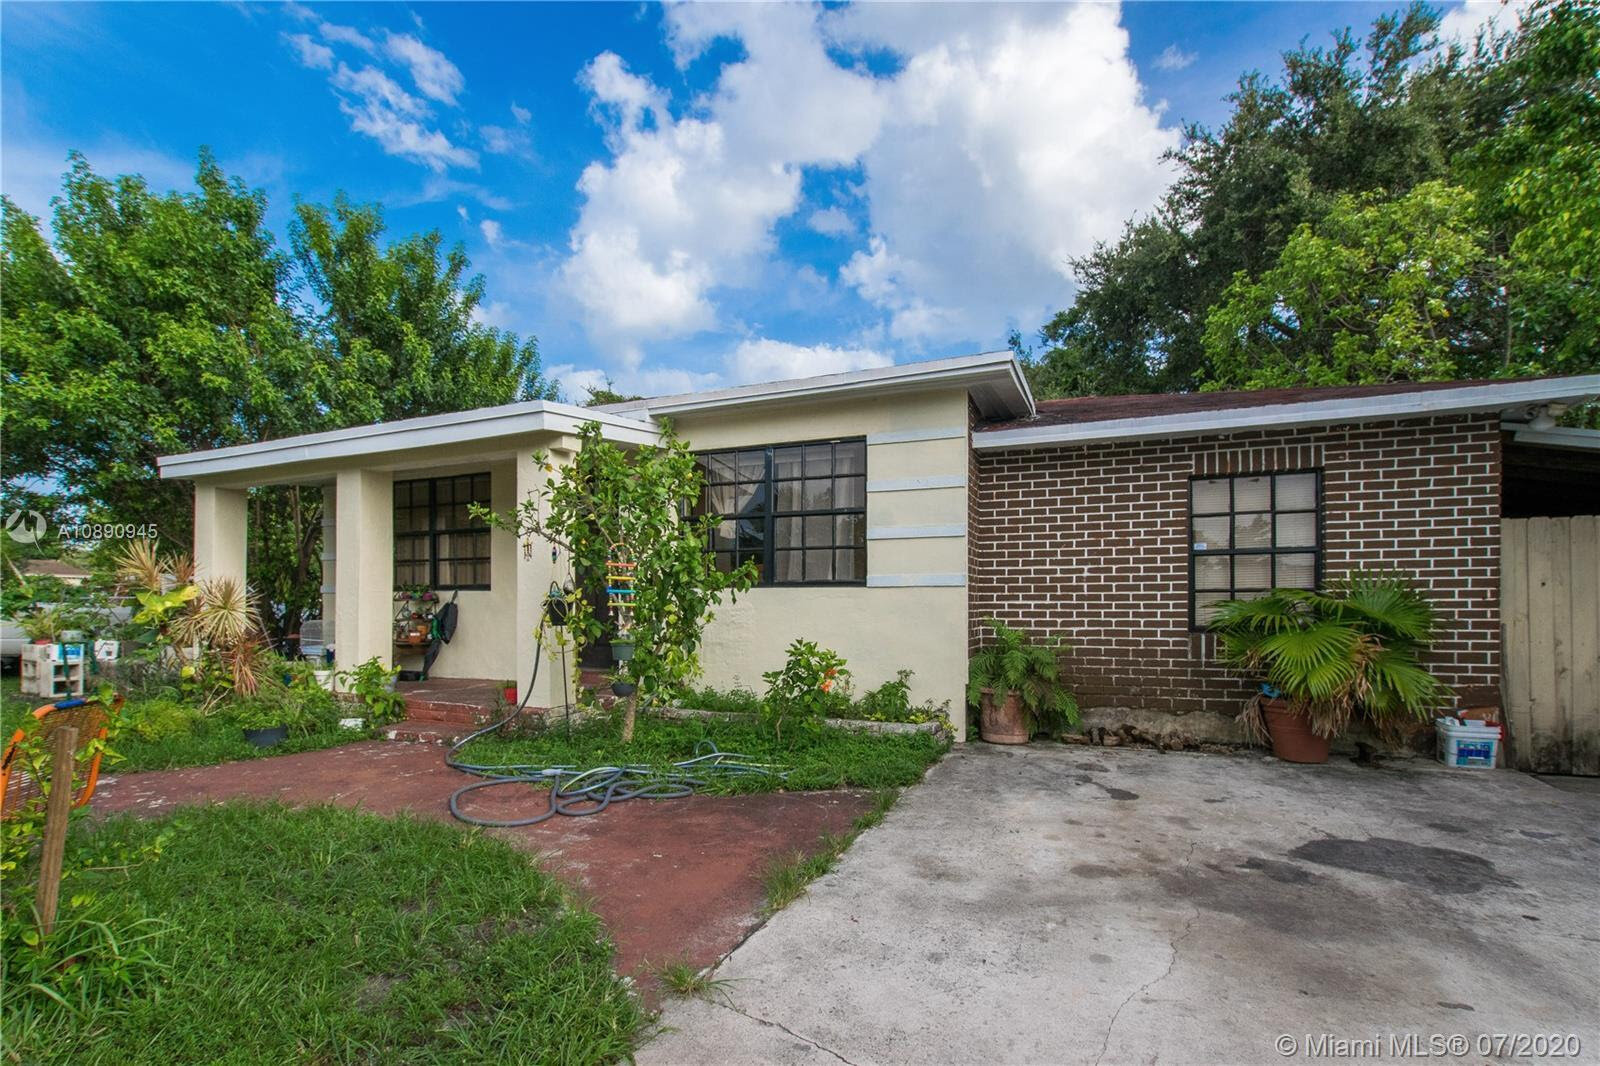 3780 NW 165 Street, Miami Gardens, FL 33054